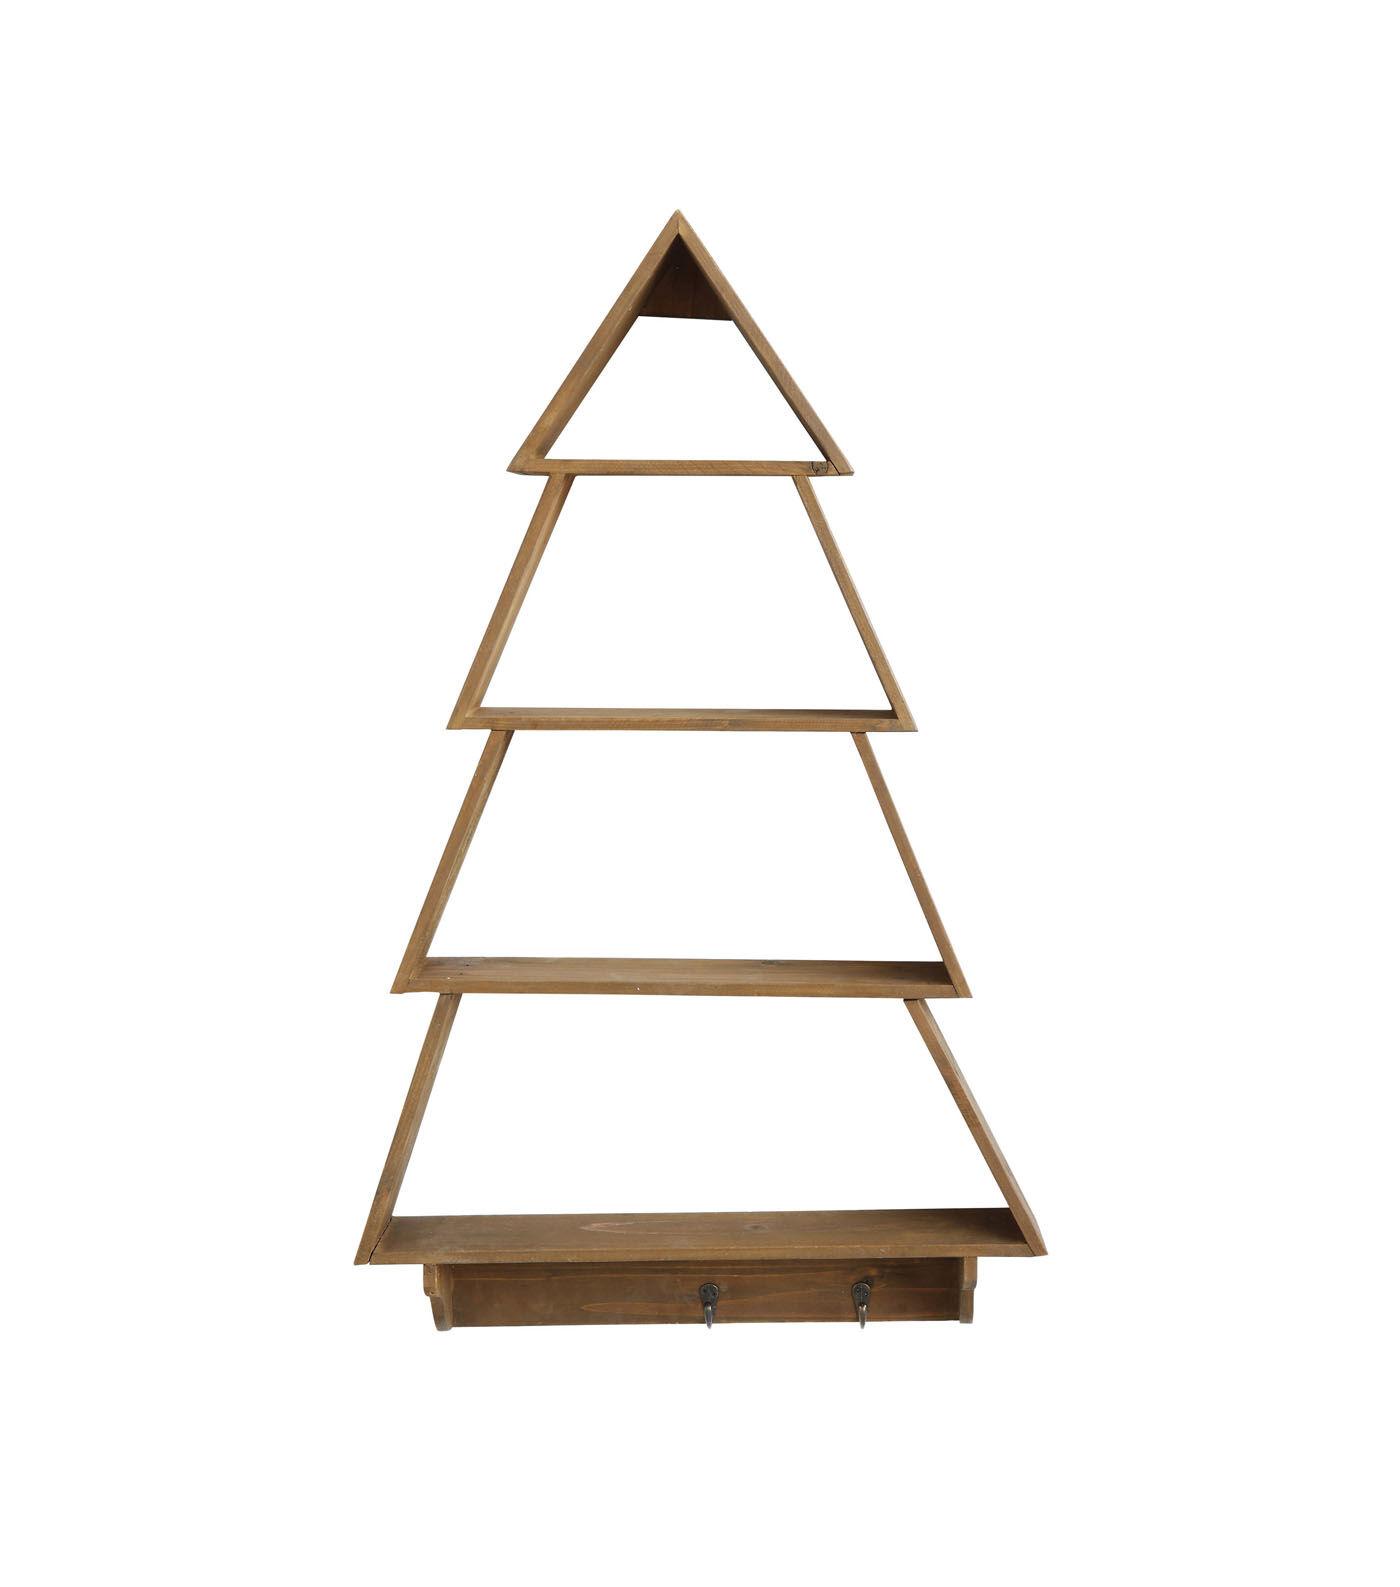 3R Studios 3 Hook Fir Wood Tree Shaped Wall Shelf